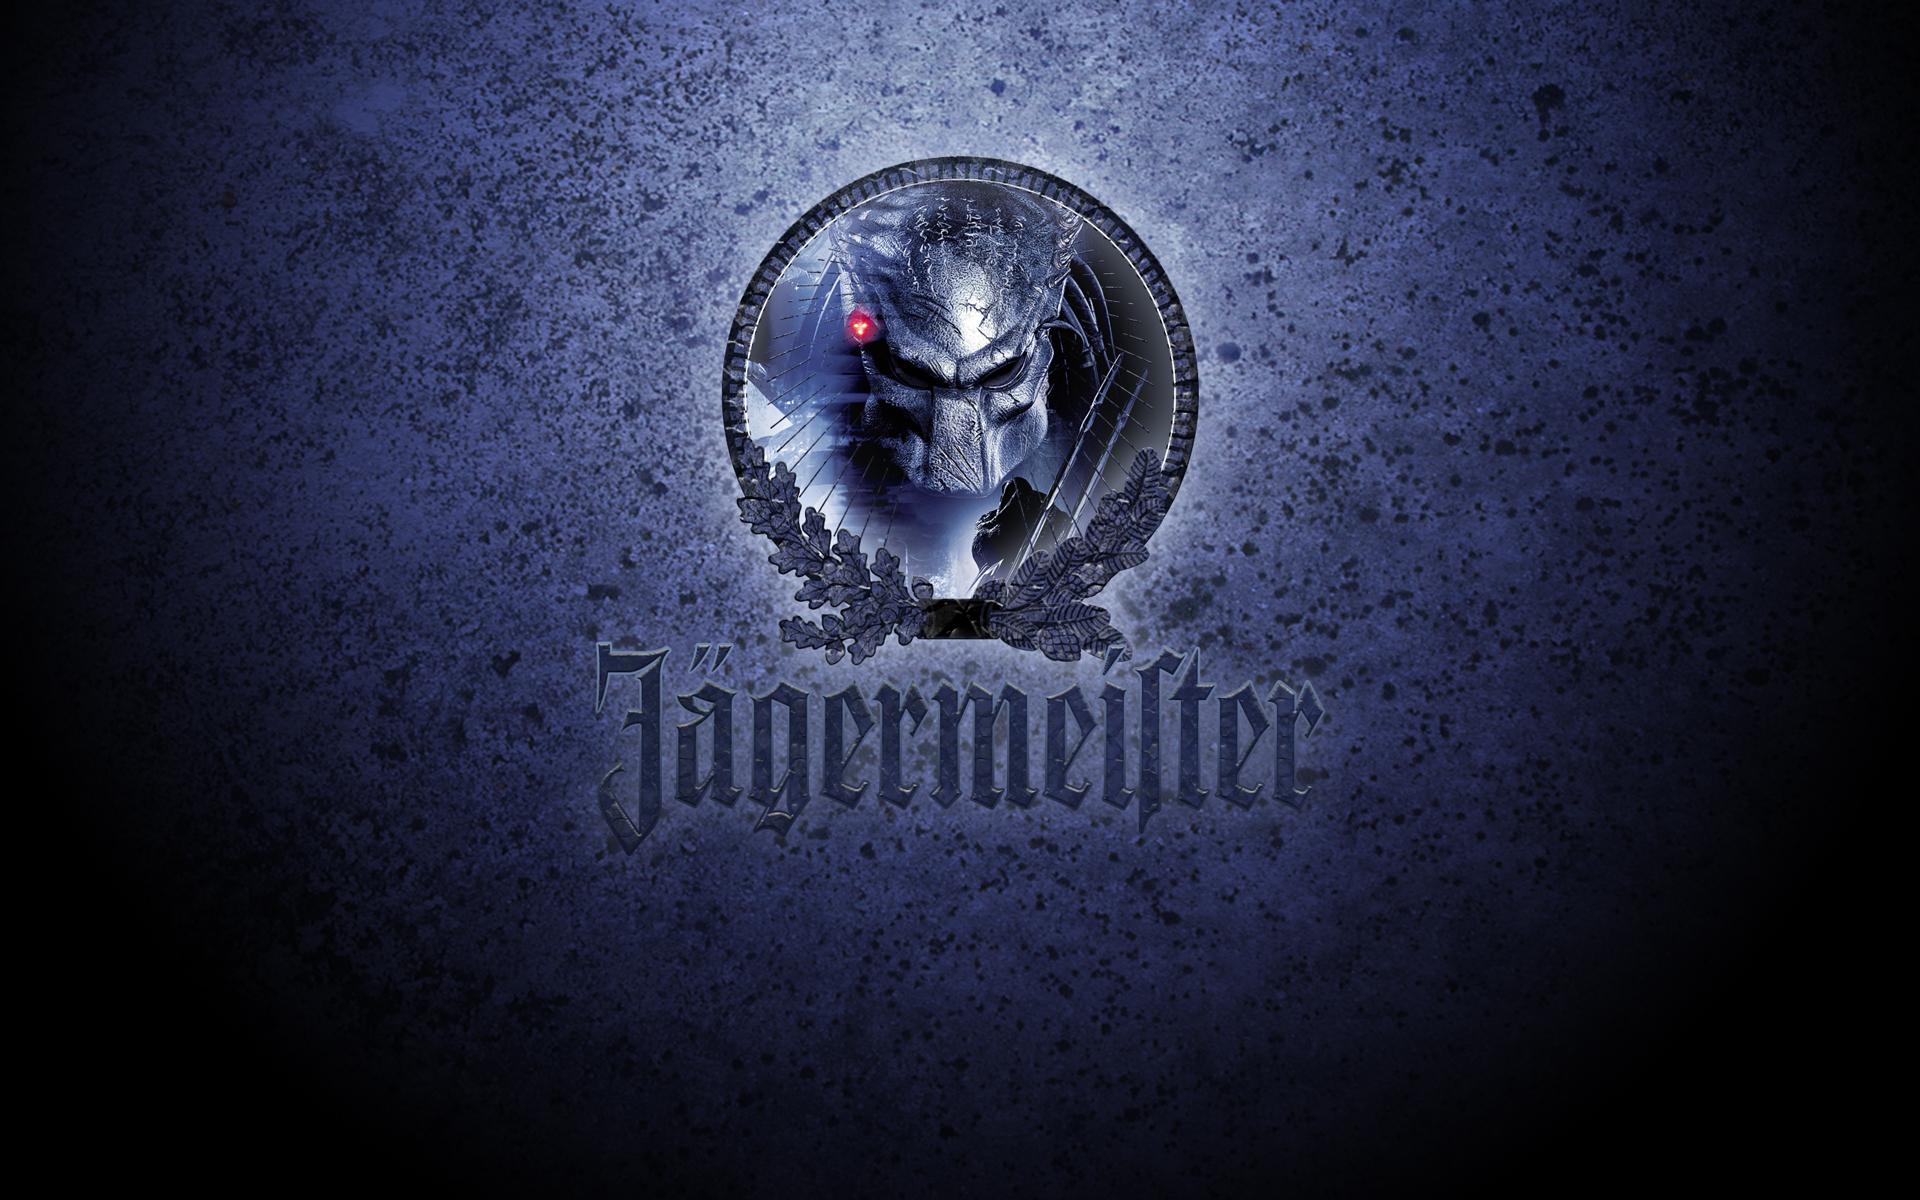 jagermeister wallpaper desktop - photo #19